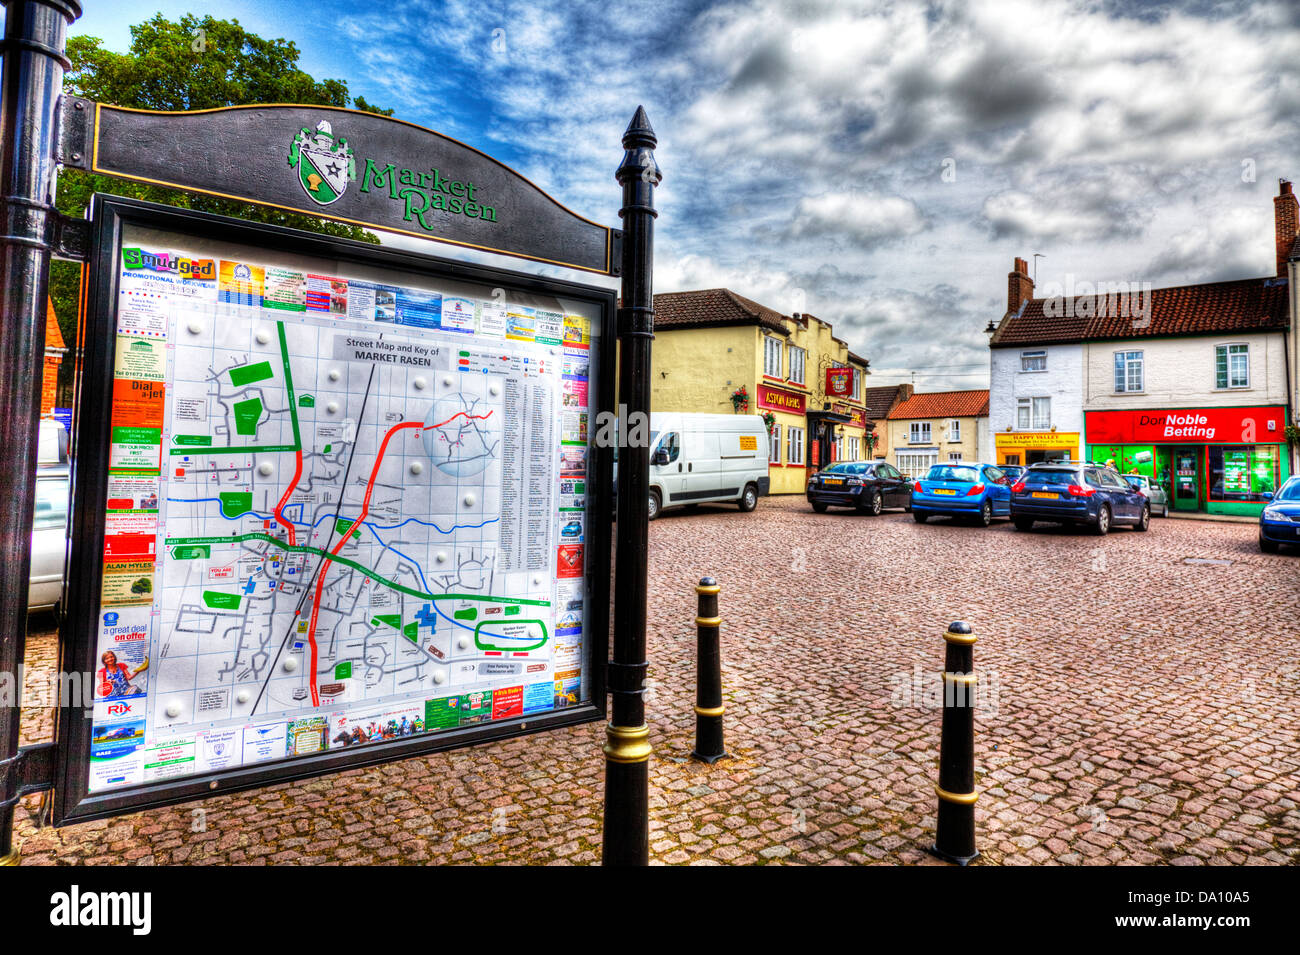 Market Rasen town village centre sign board market place, Lincolnshire, UK, England - Stock Image